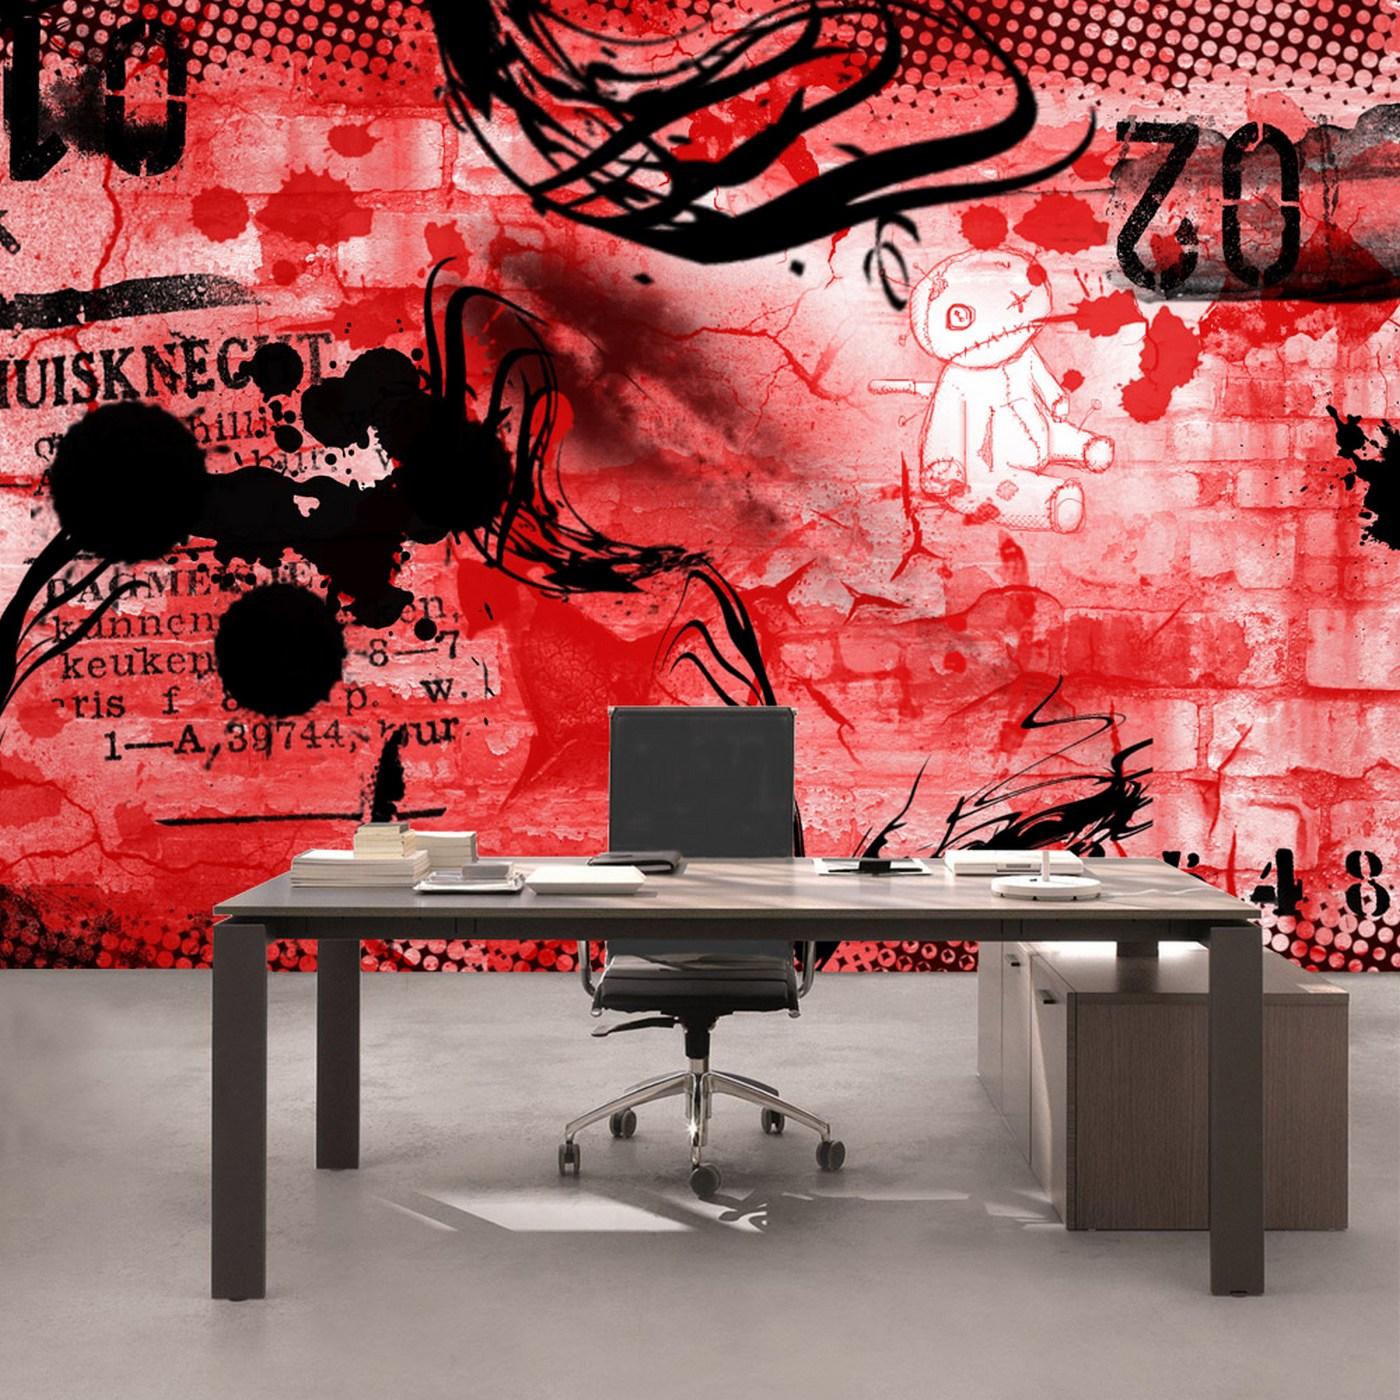 Kiss Fototapeten Zu Besten Preisen Fototapete Red Graffiti Wall